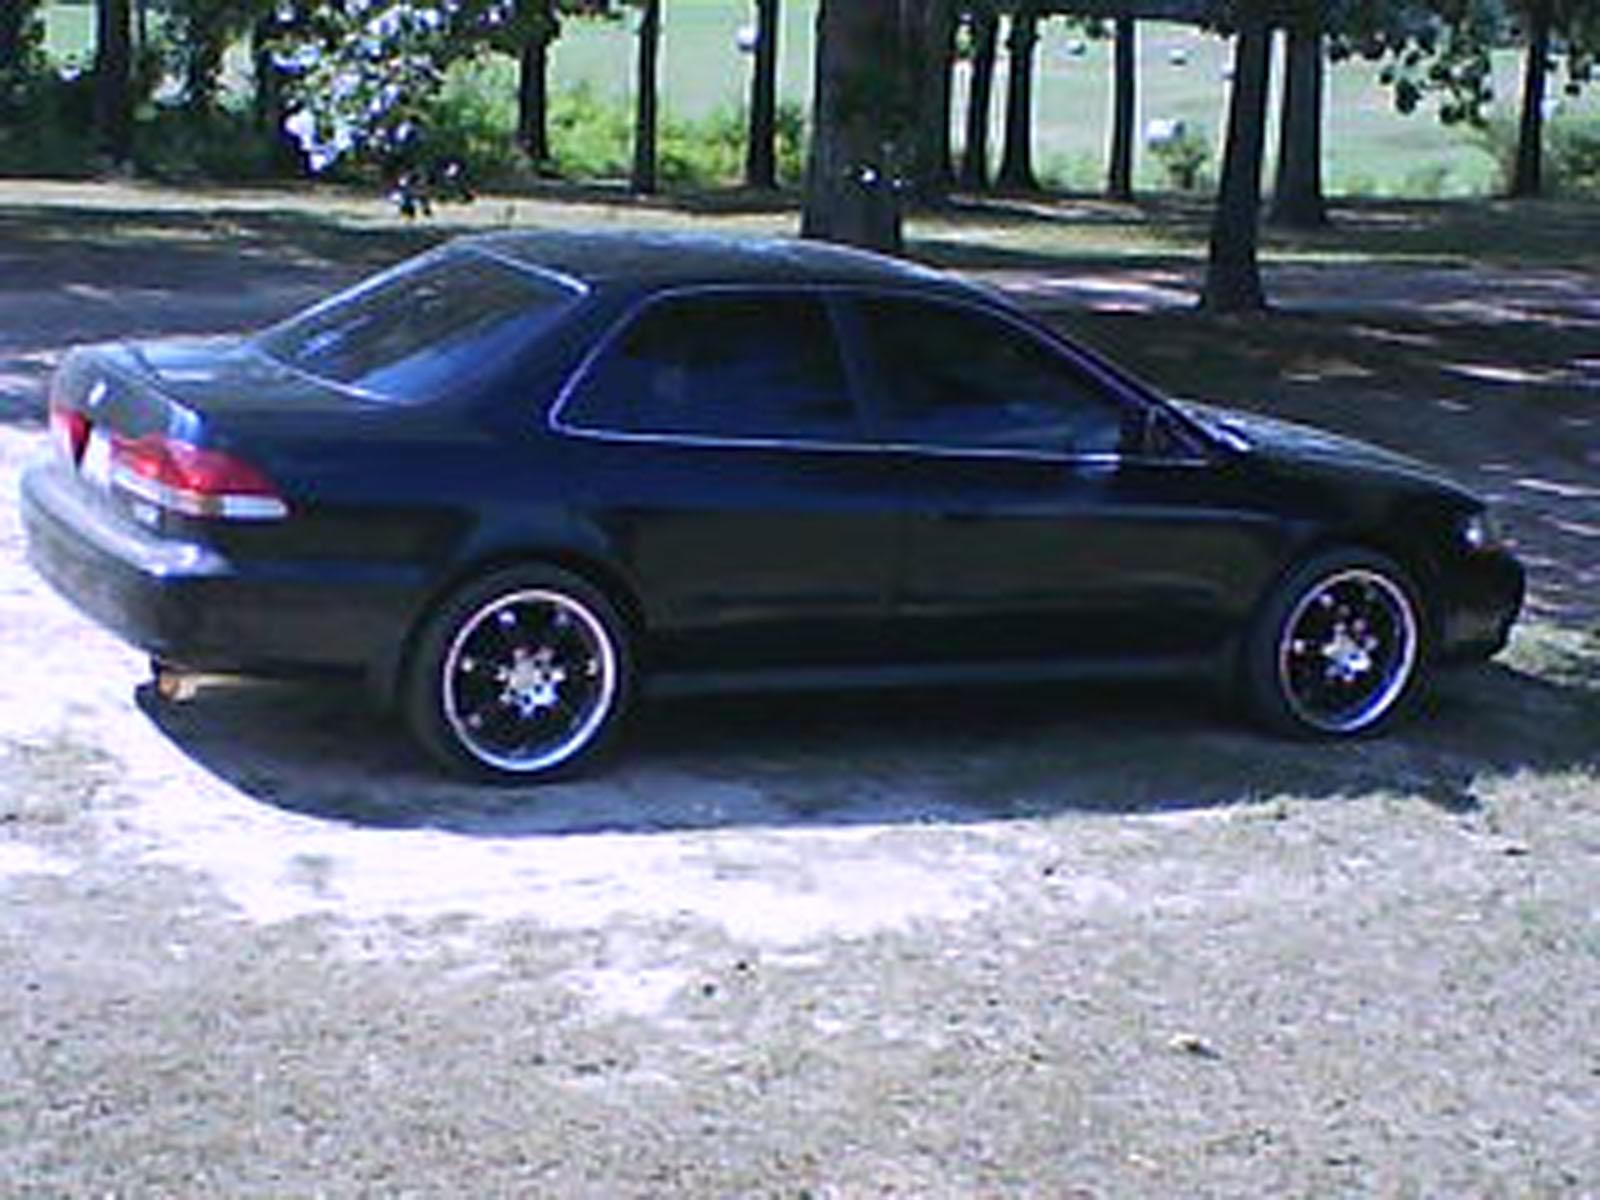 Honda Accord 2002 Modified